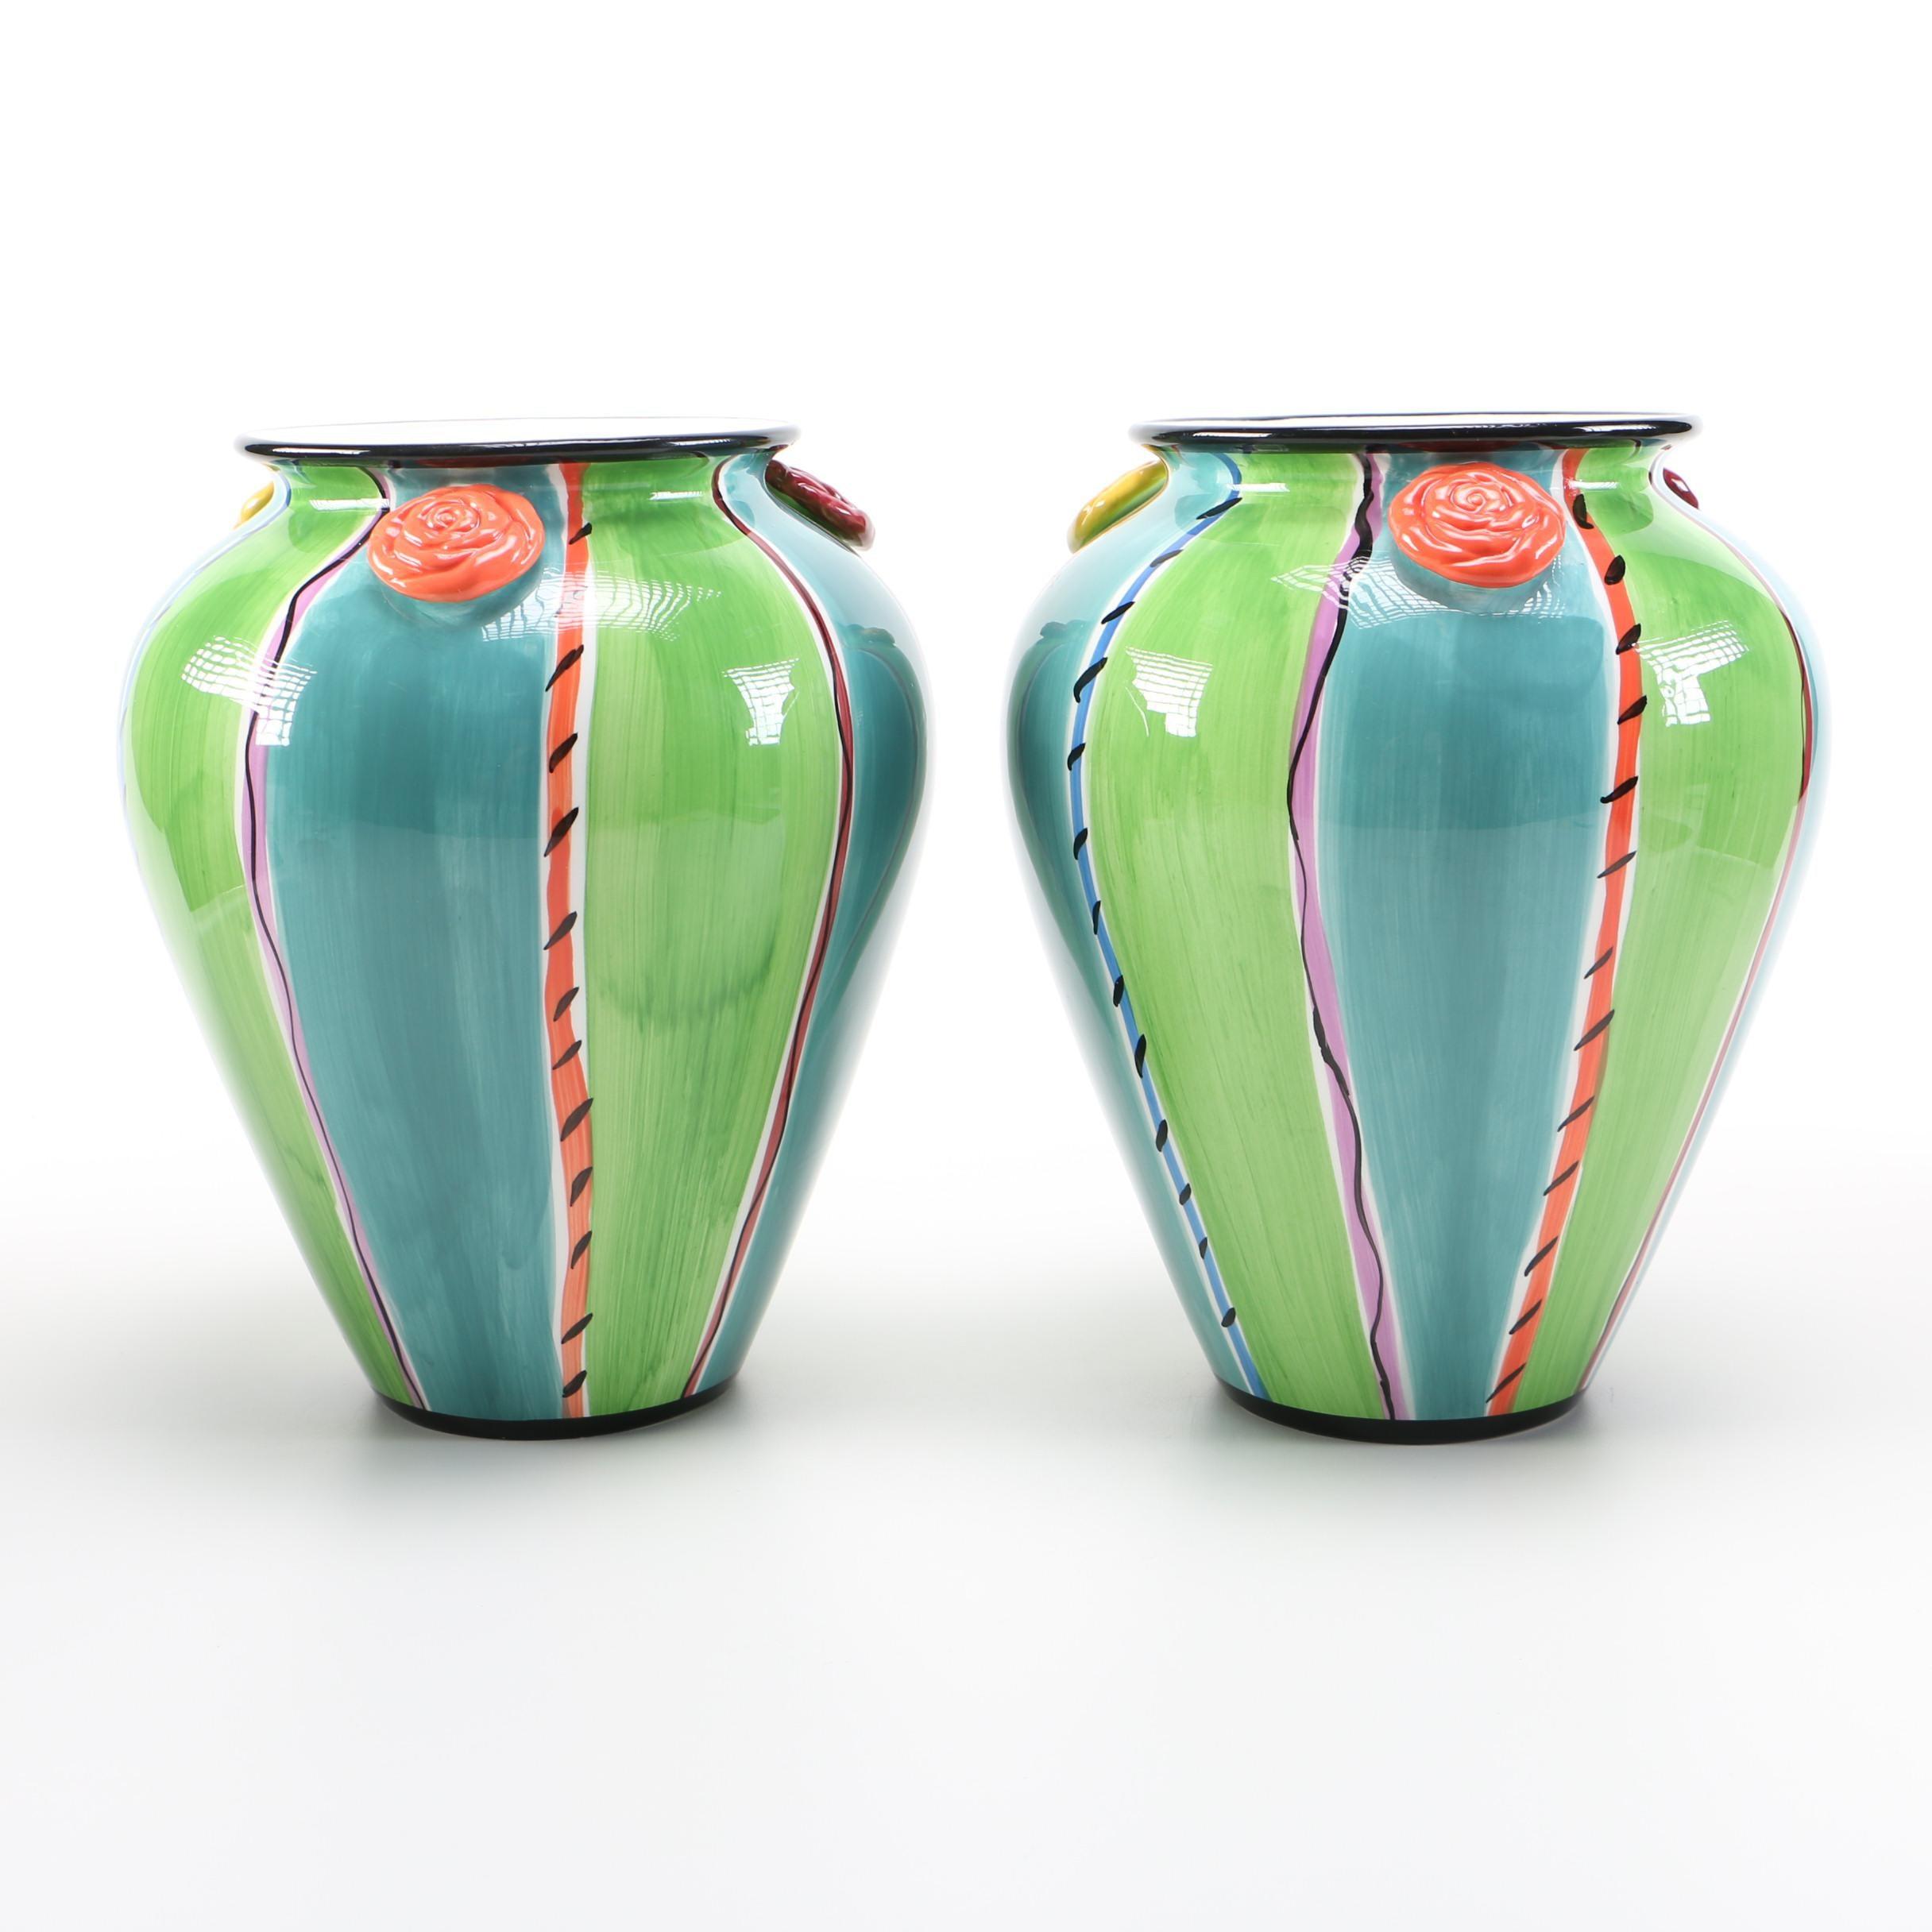 Pair of Vases by Blue Ridge Designs INC.